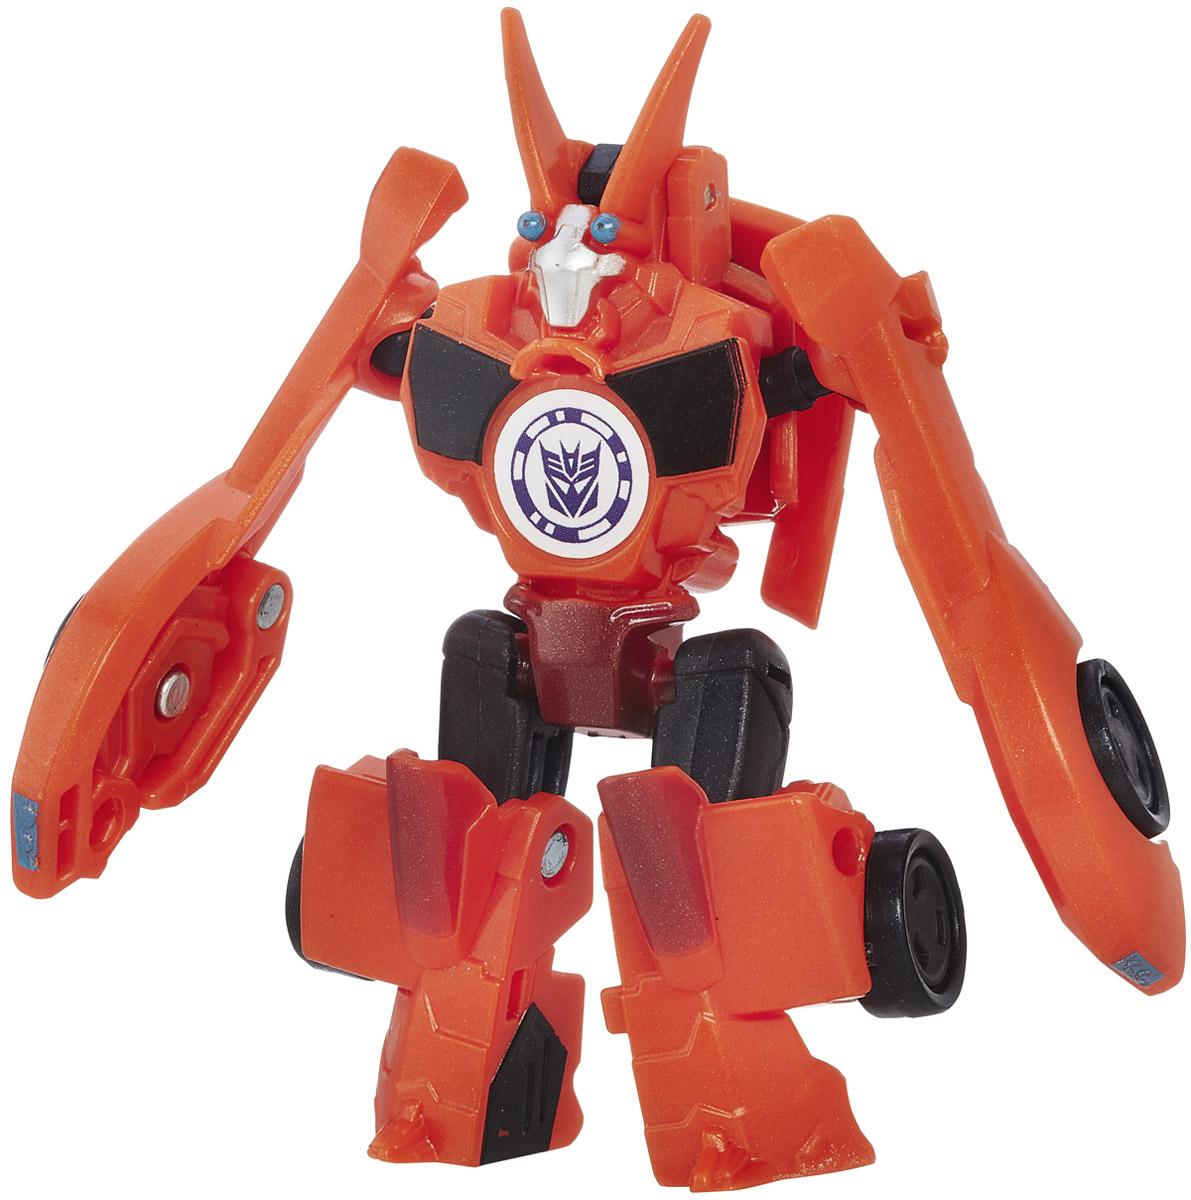 Transformers Трансформер Combiner Force Bisk transformers трансформер the last knight grimlock